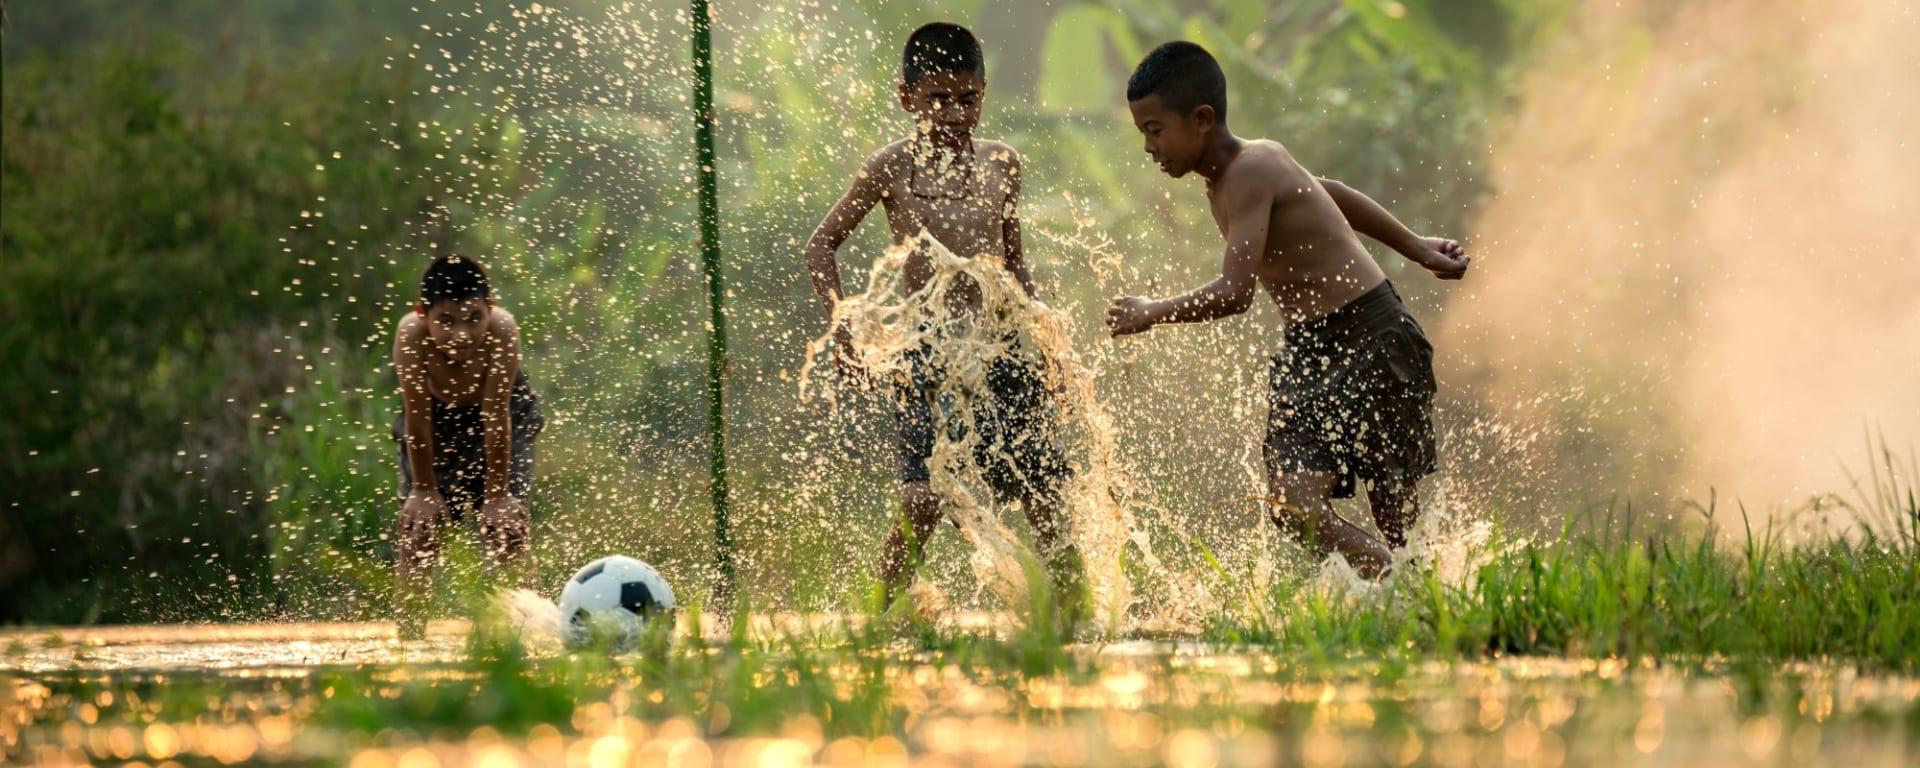 Circuit en voiture de location au sud de Bangkok: Kids playing football on the river